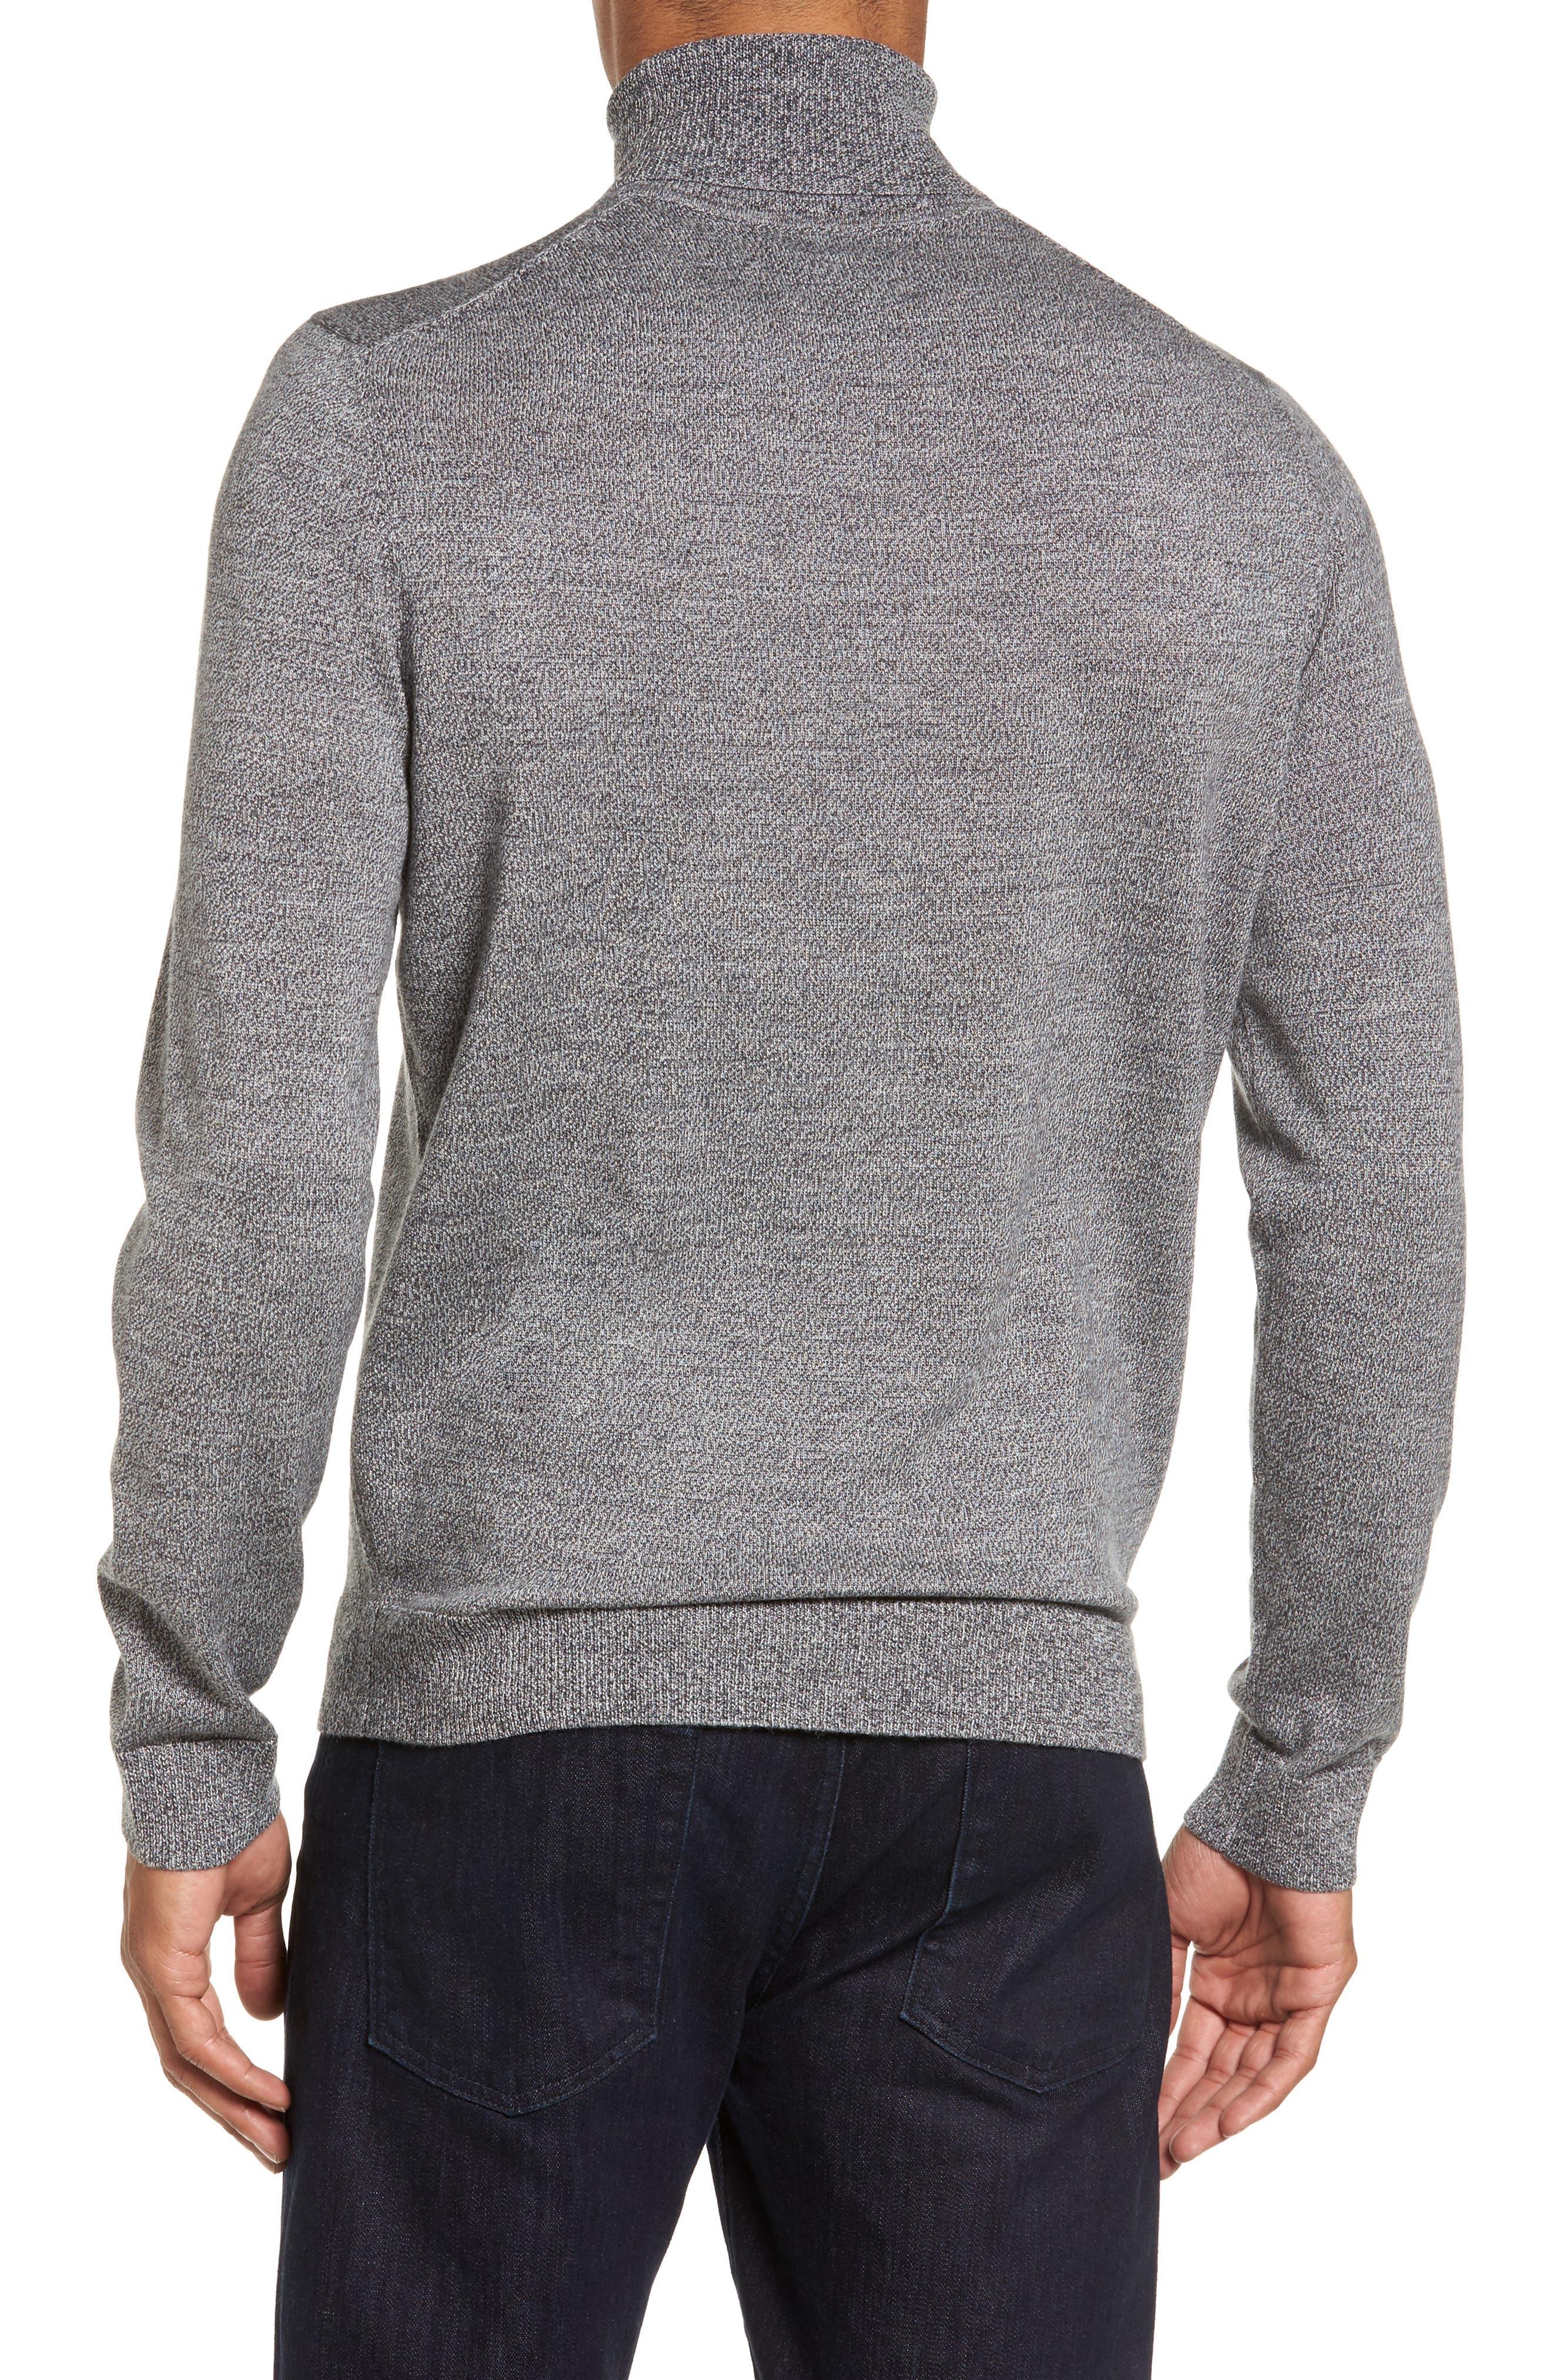 Merino Wool Turtleneck Sweater,                             Alternate thumbnail 2, color,                             Grey Shade Marl